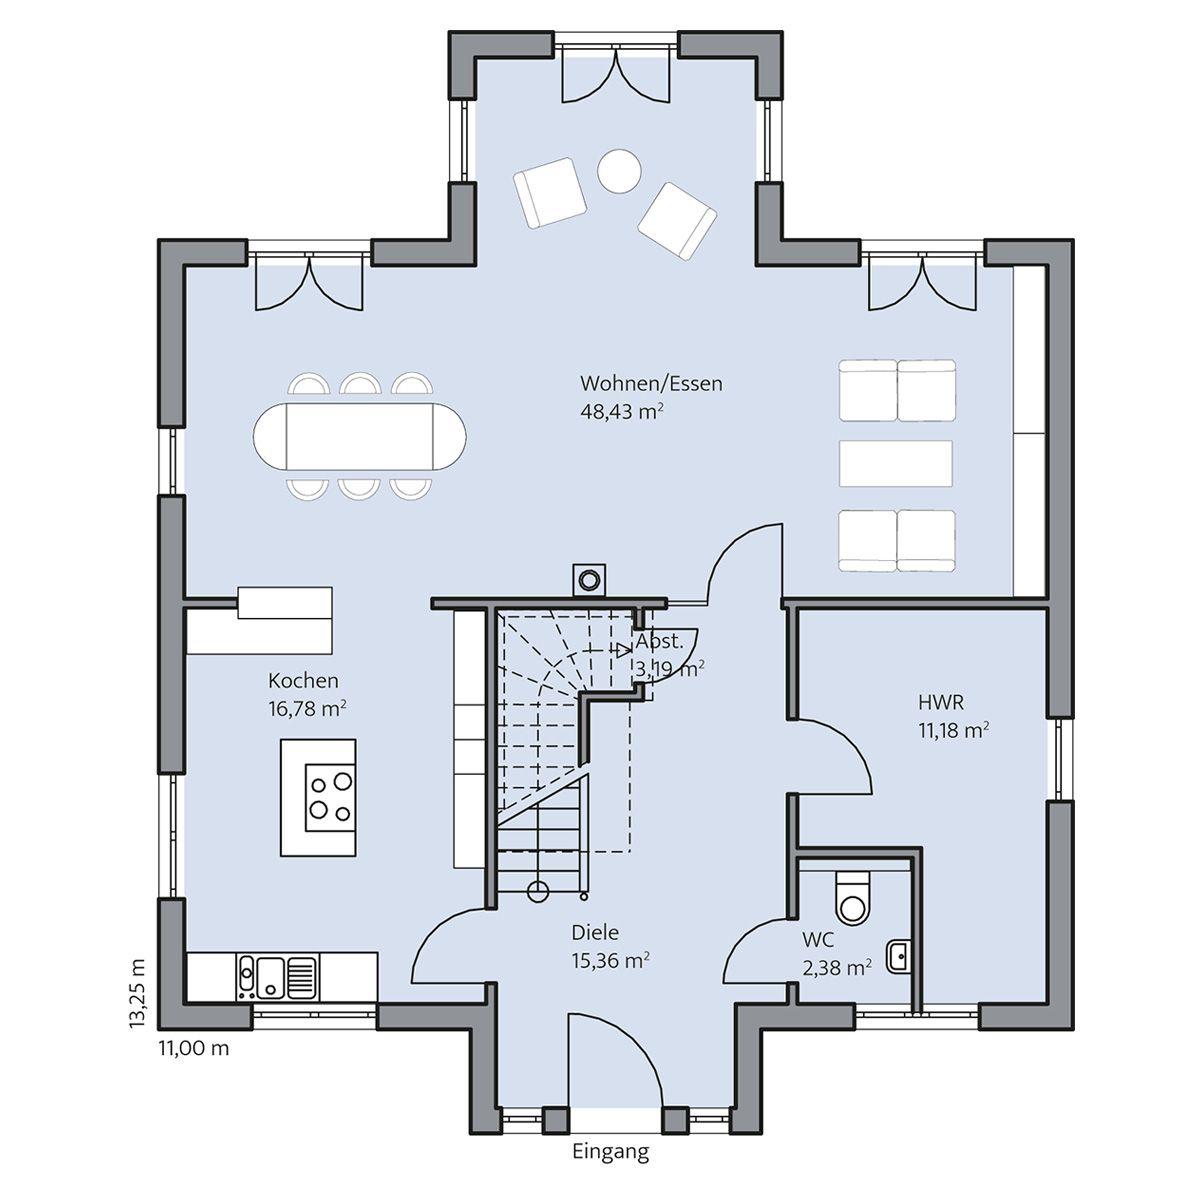 Haus-Sander_Grundriss_EG_bemasst_col16-hg.jpg (1200×1200) | Ideen ...